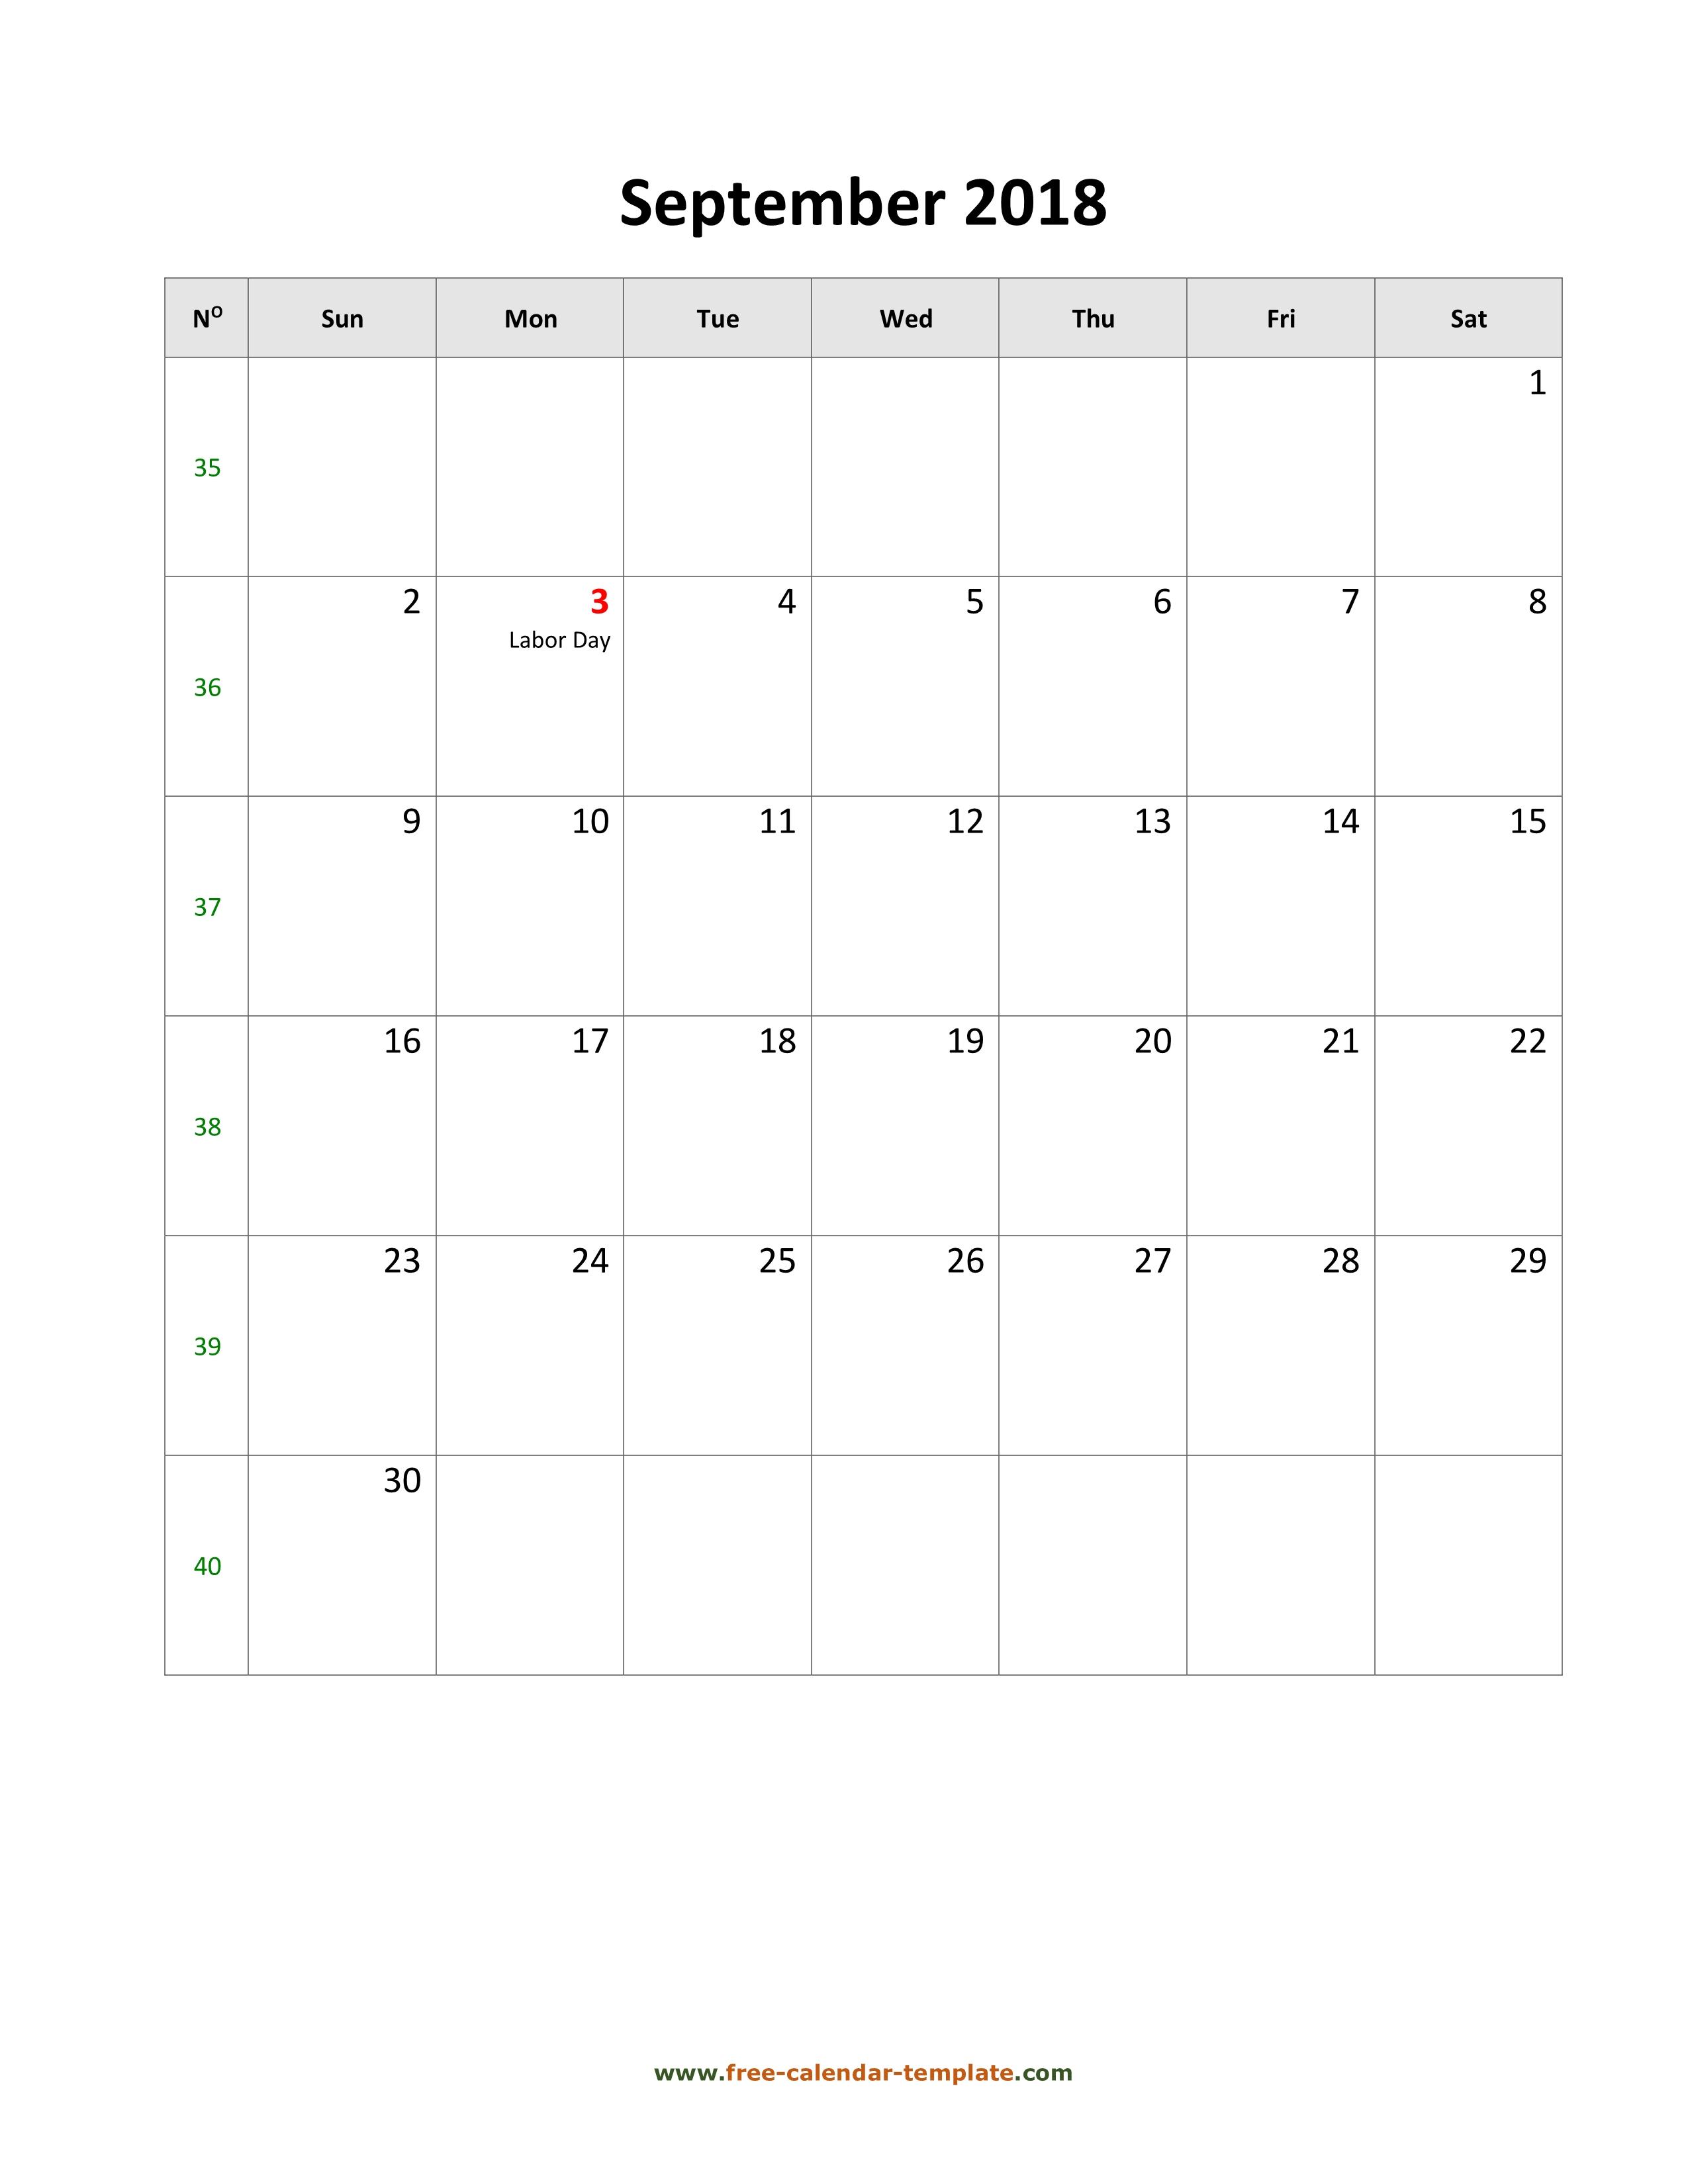 2018 September Calendar (Blank Vertical Template)   Free-Calendar with regard to September Printable Monthly Calendars Blank